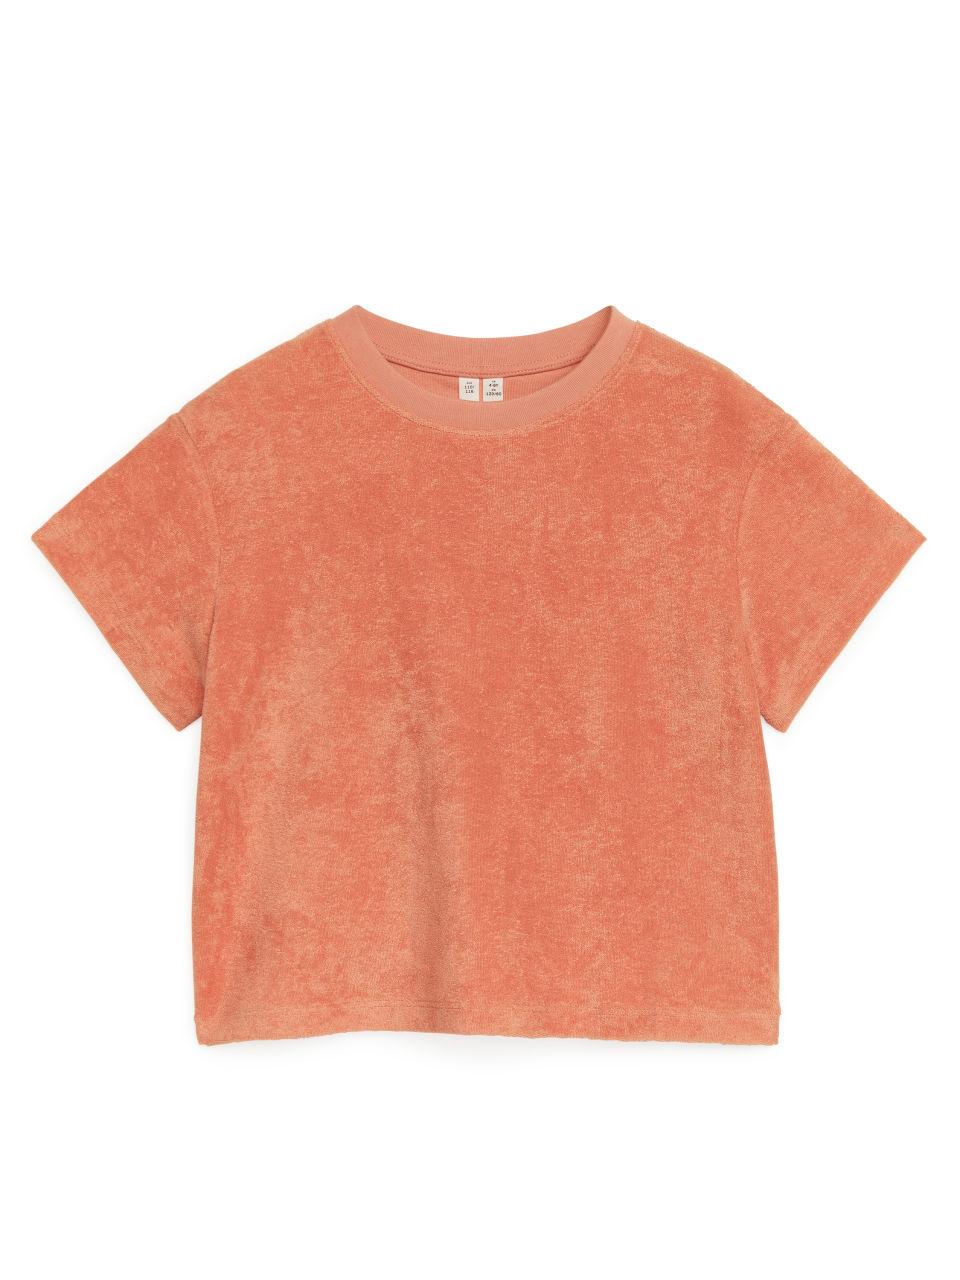 Cotton Towelling T-Shirt - Orange